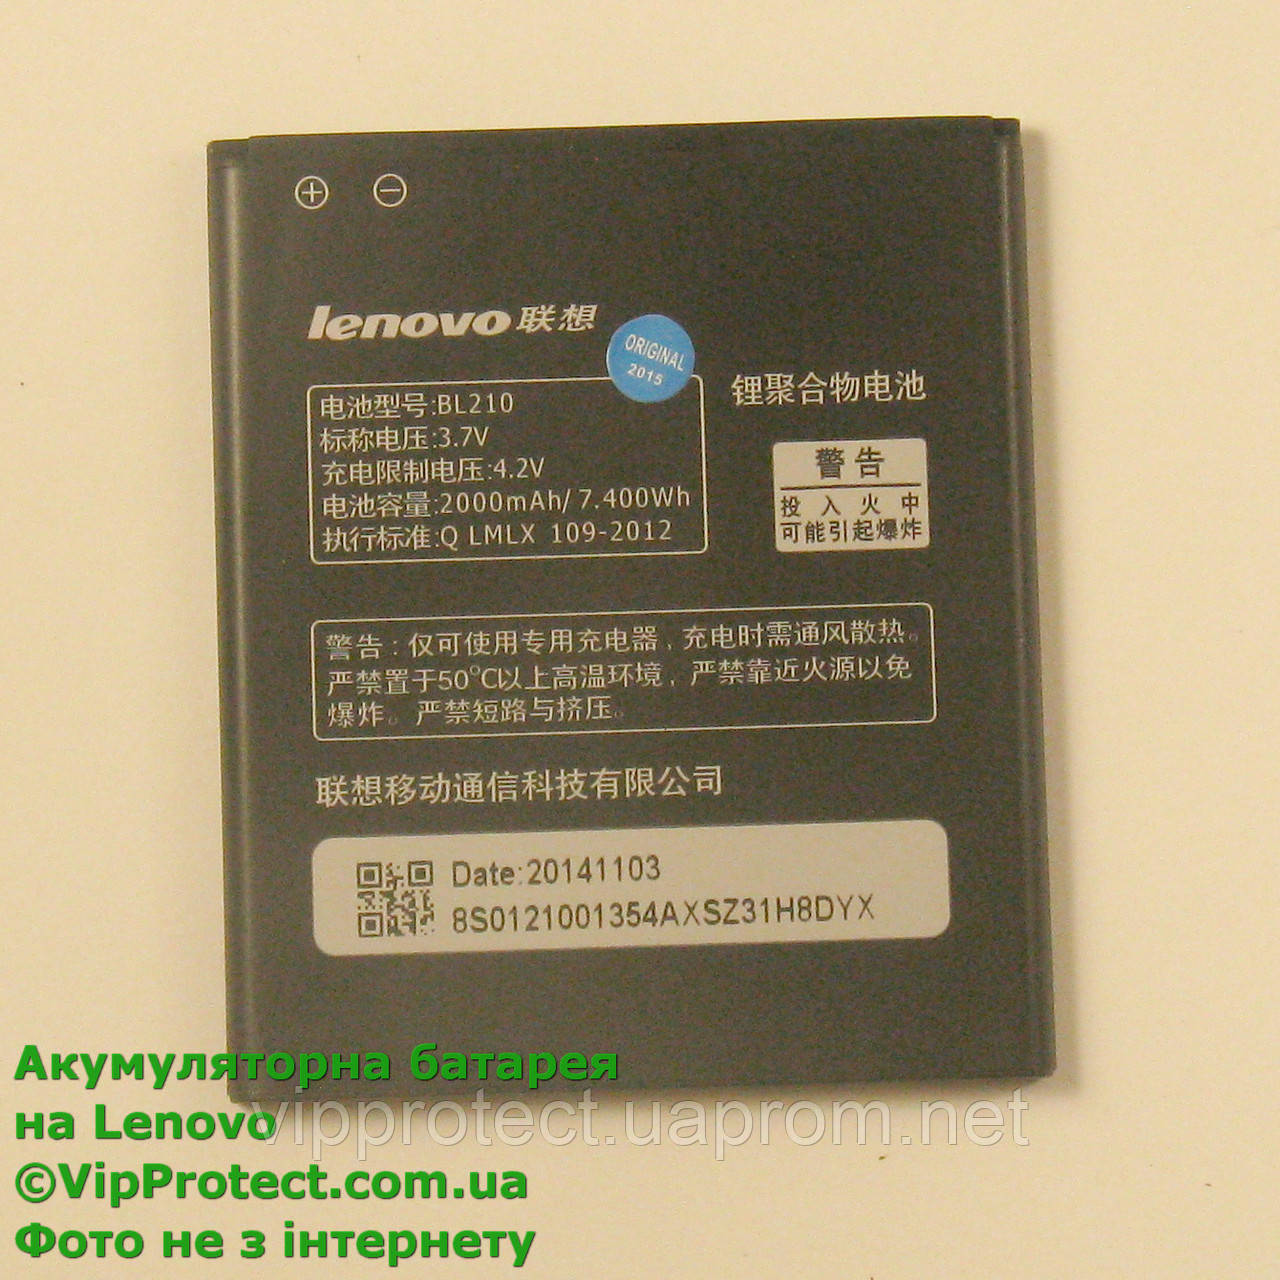 Lenovo S650 BL210 акумулятор 2000мА⋅год оригінальний